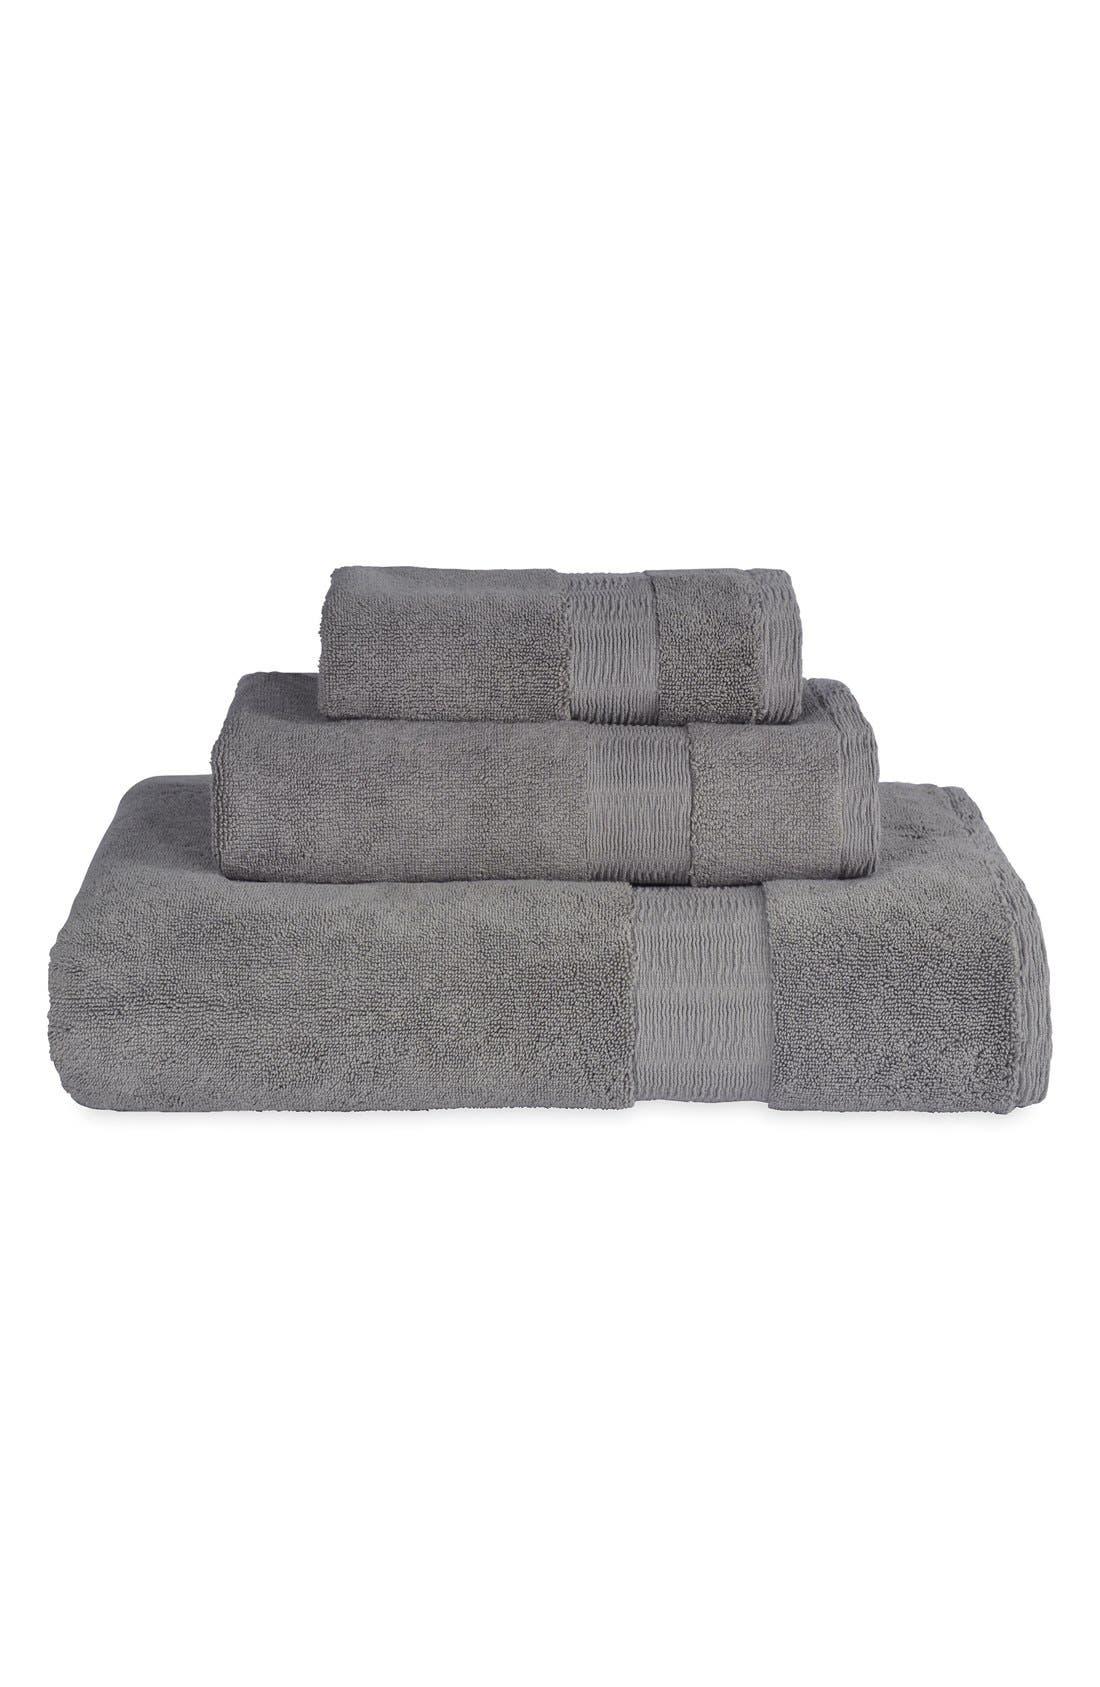 Mercer Bath Towel,                             Alternate thumbnail 2, color,                             Grey